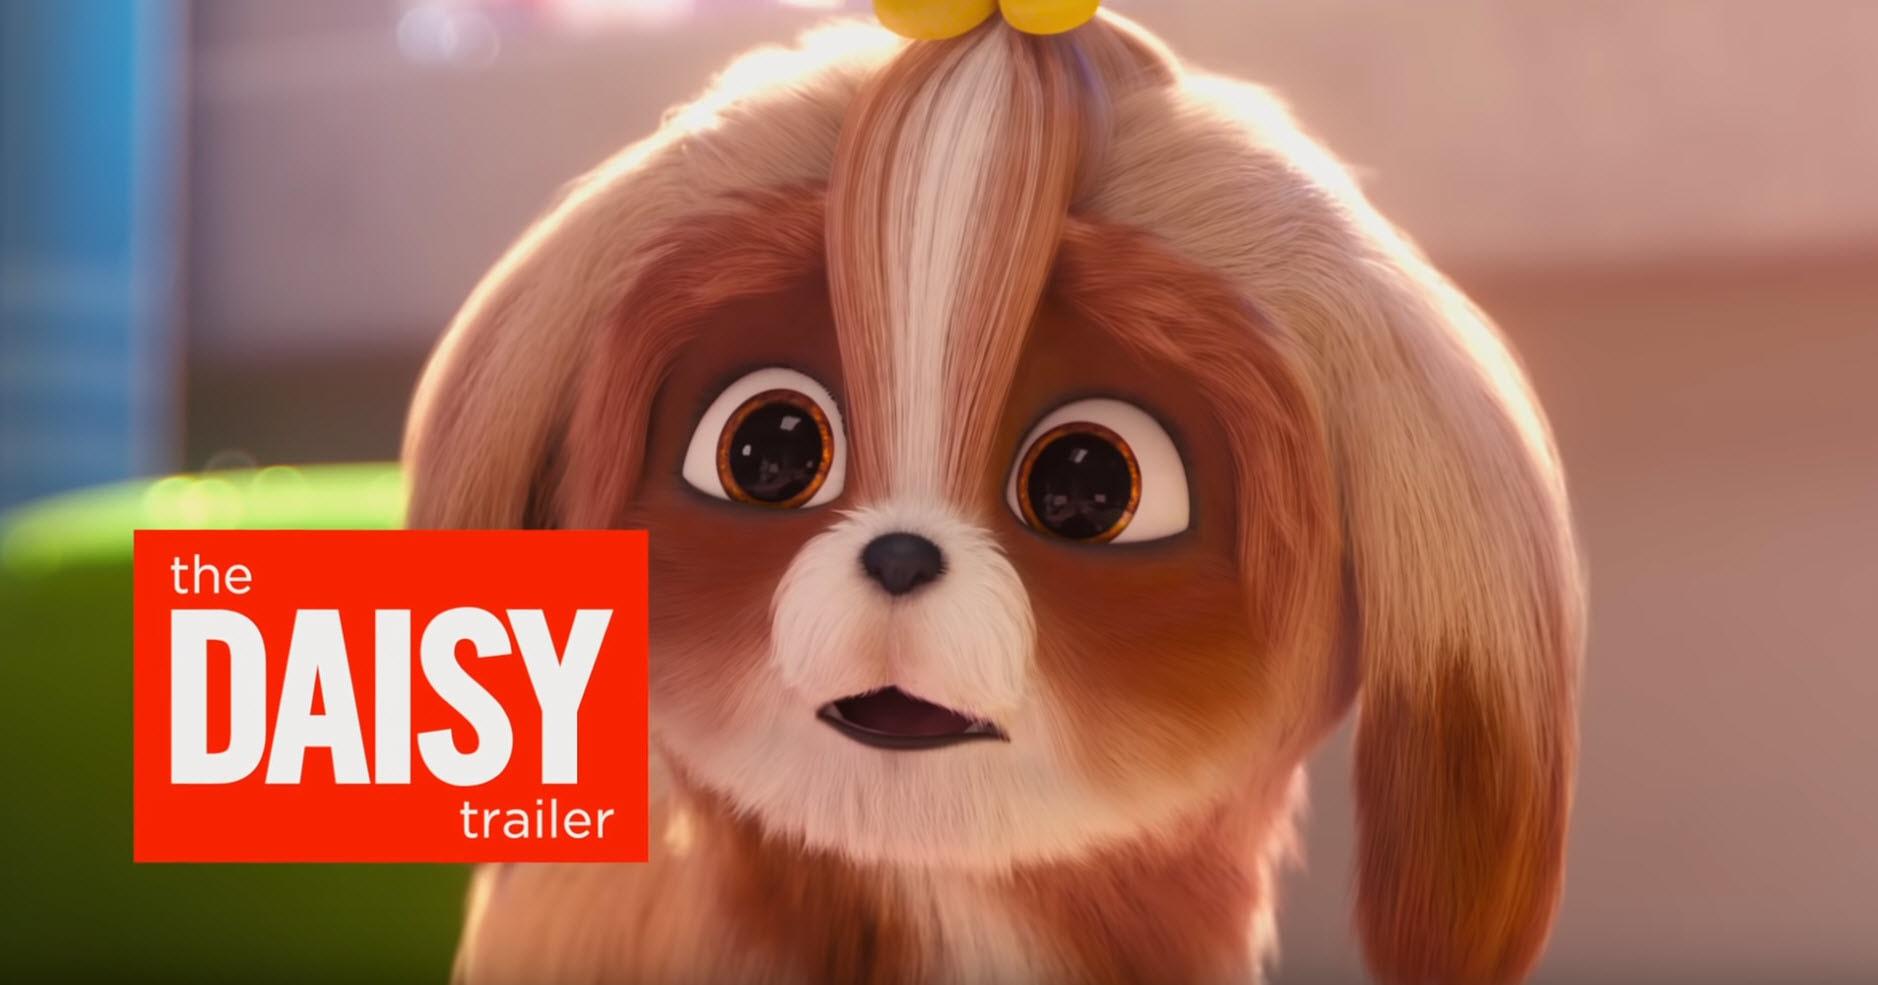 DAISY Trailer